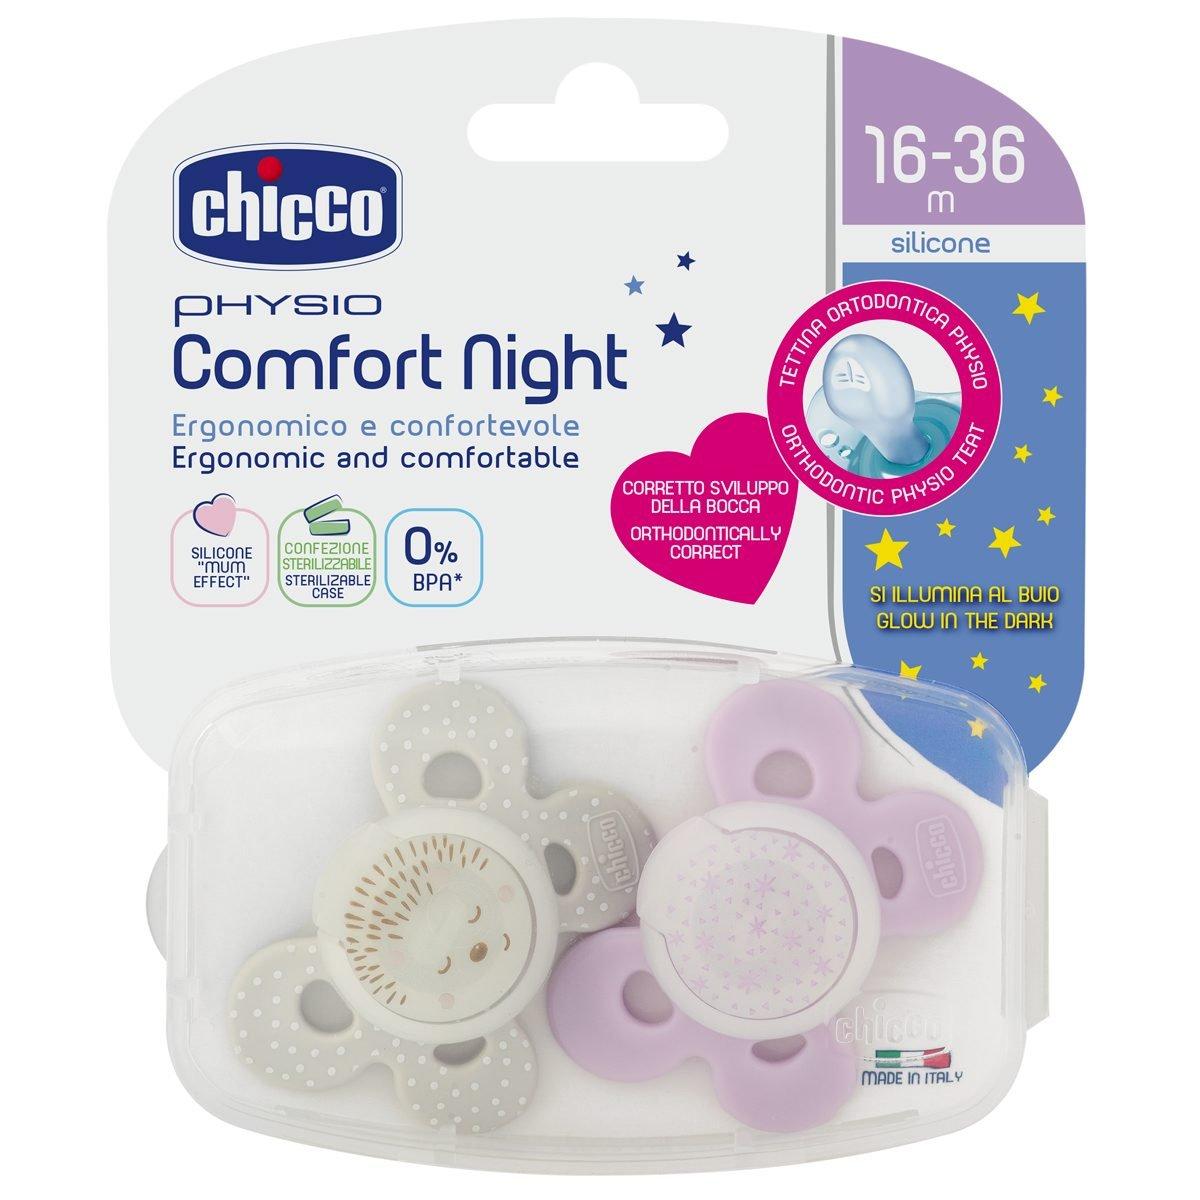 Chicco Physio Comfort - Pack de 2 chupetes de silicona 16-36 m, color rosa (diseños surtidos)